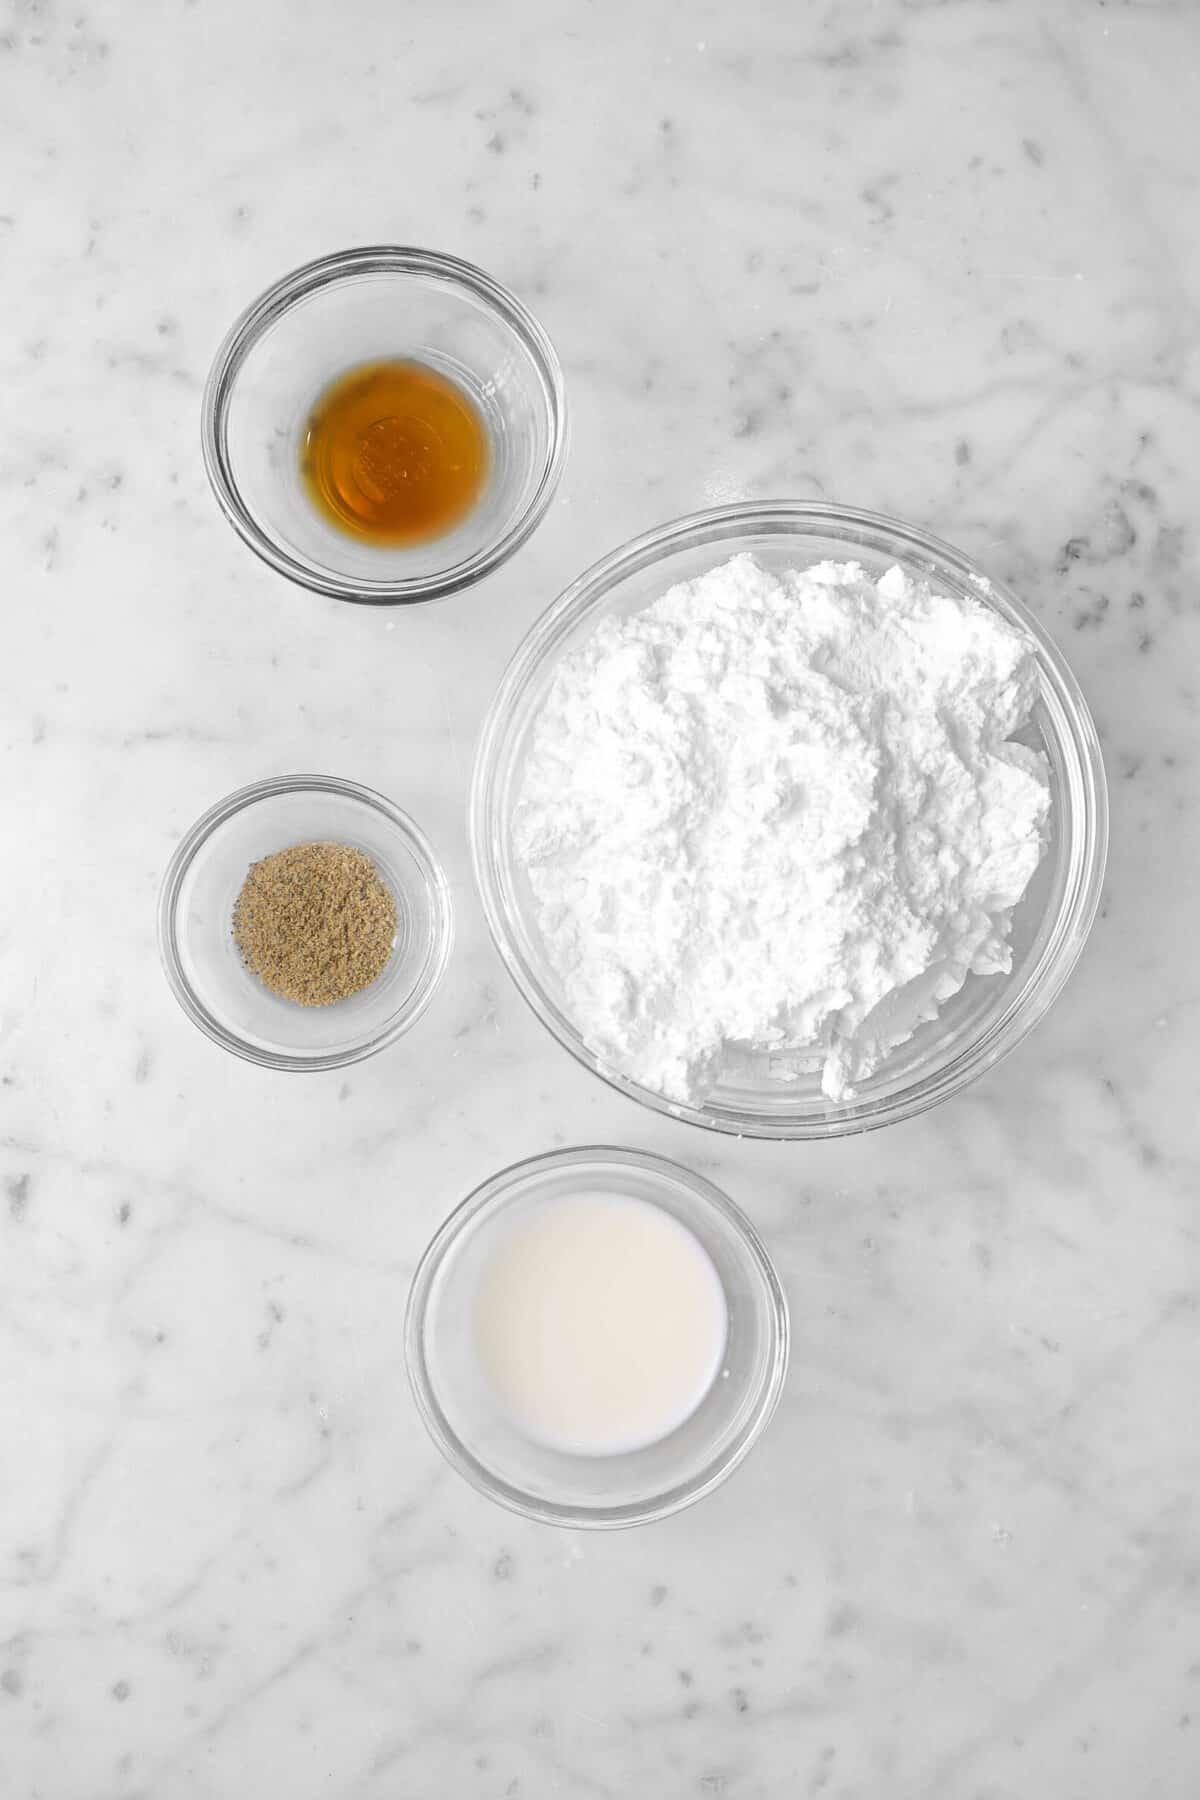 powdered sugar, vanilla, ground cardamom, and milk in glass bowls